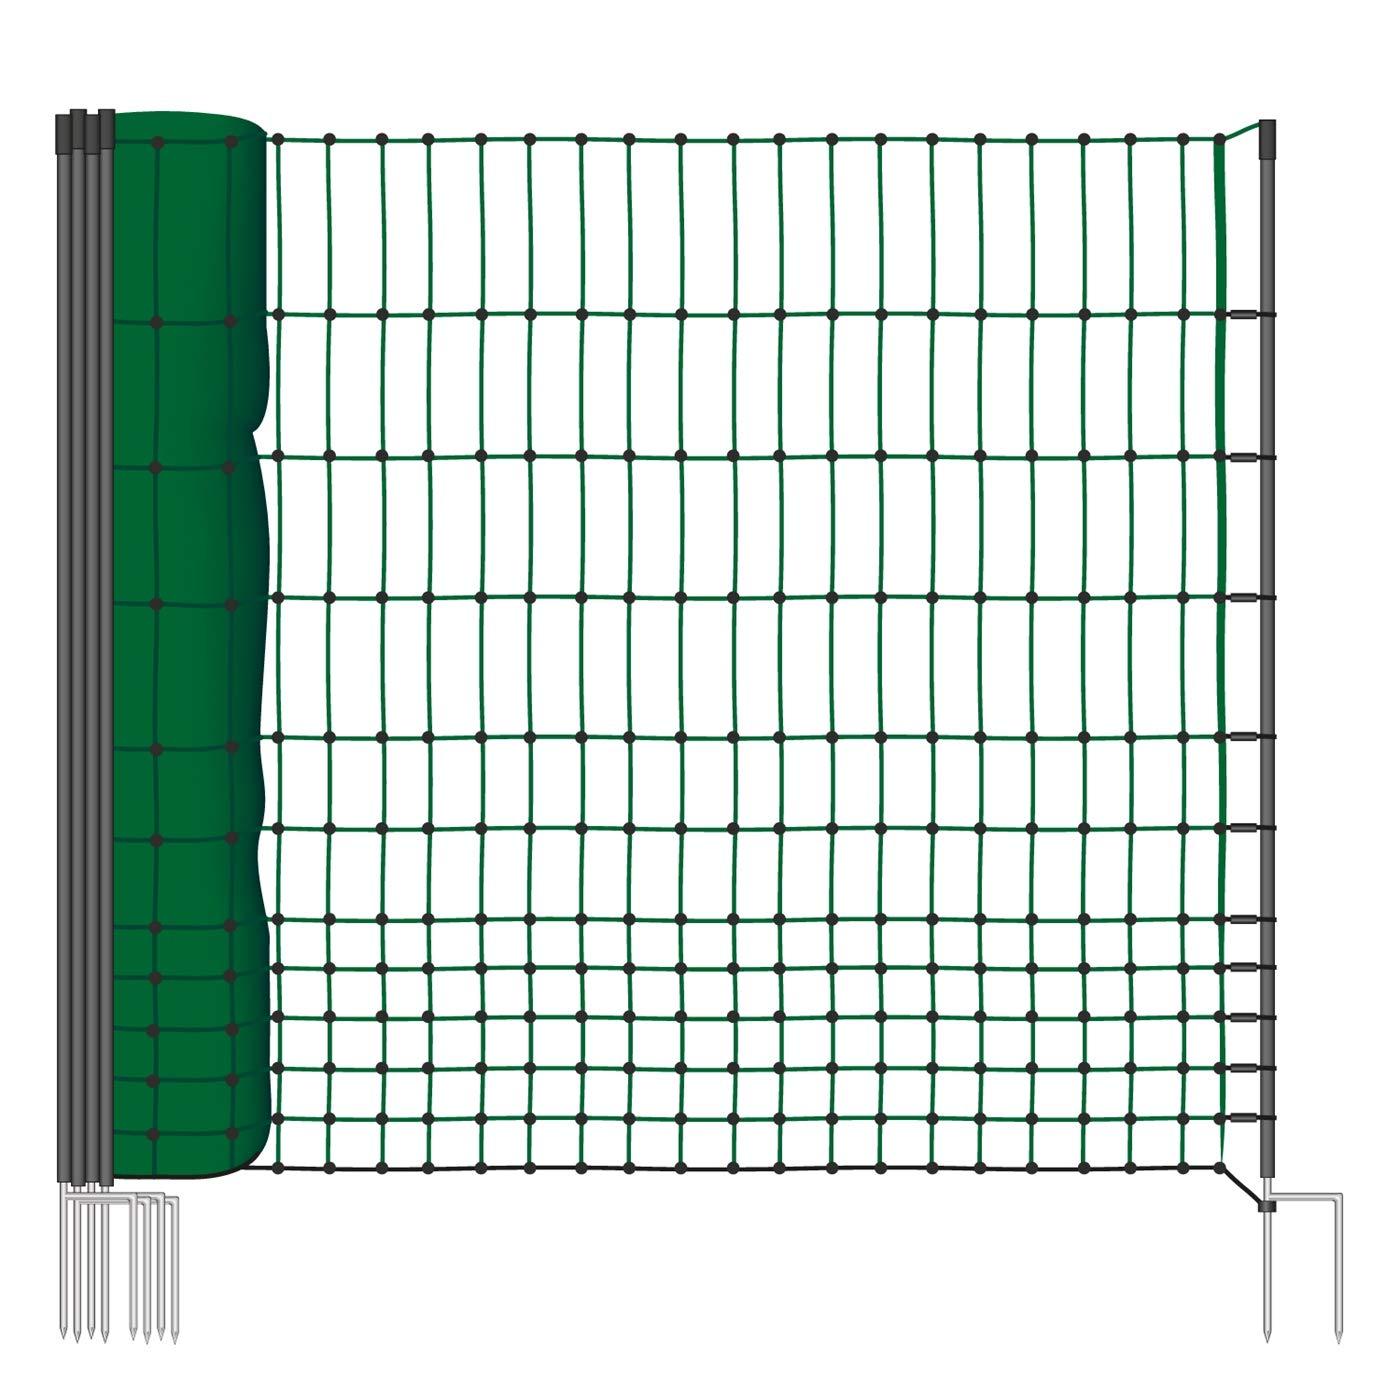 VOSS.farming 50m Geflügelnetz, Classic, 112 cm Netzhöhe, Hundenetz, Katzennetz, Gartensicherung, Weidezaun 112 cm Netzhöhe